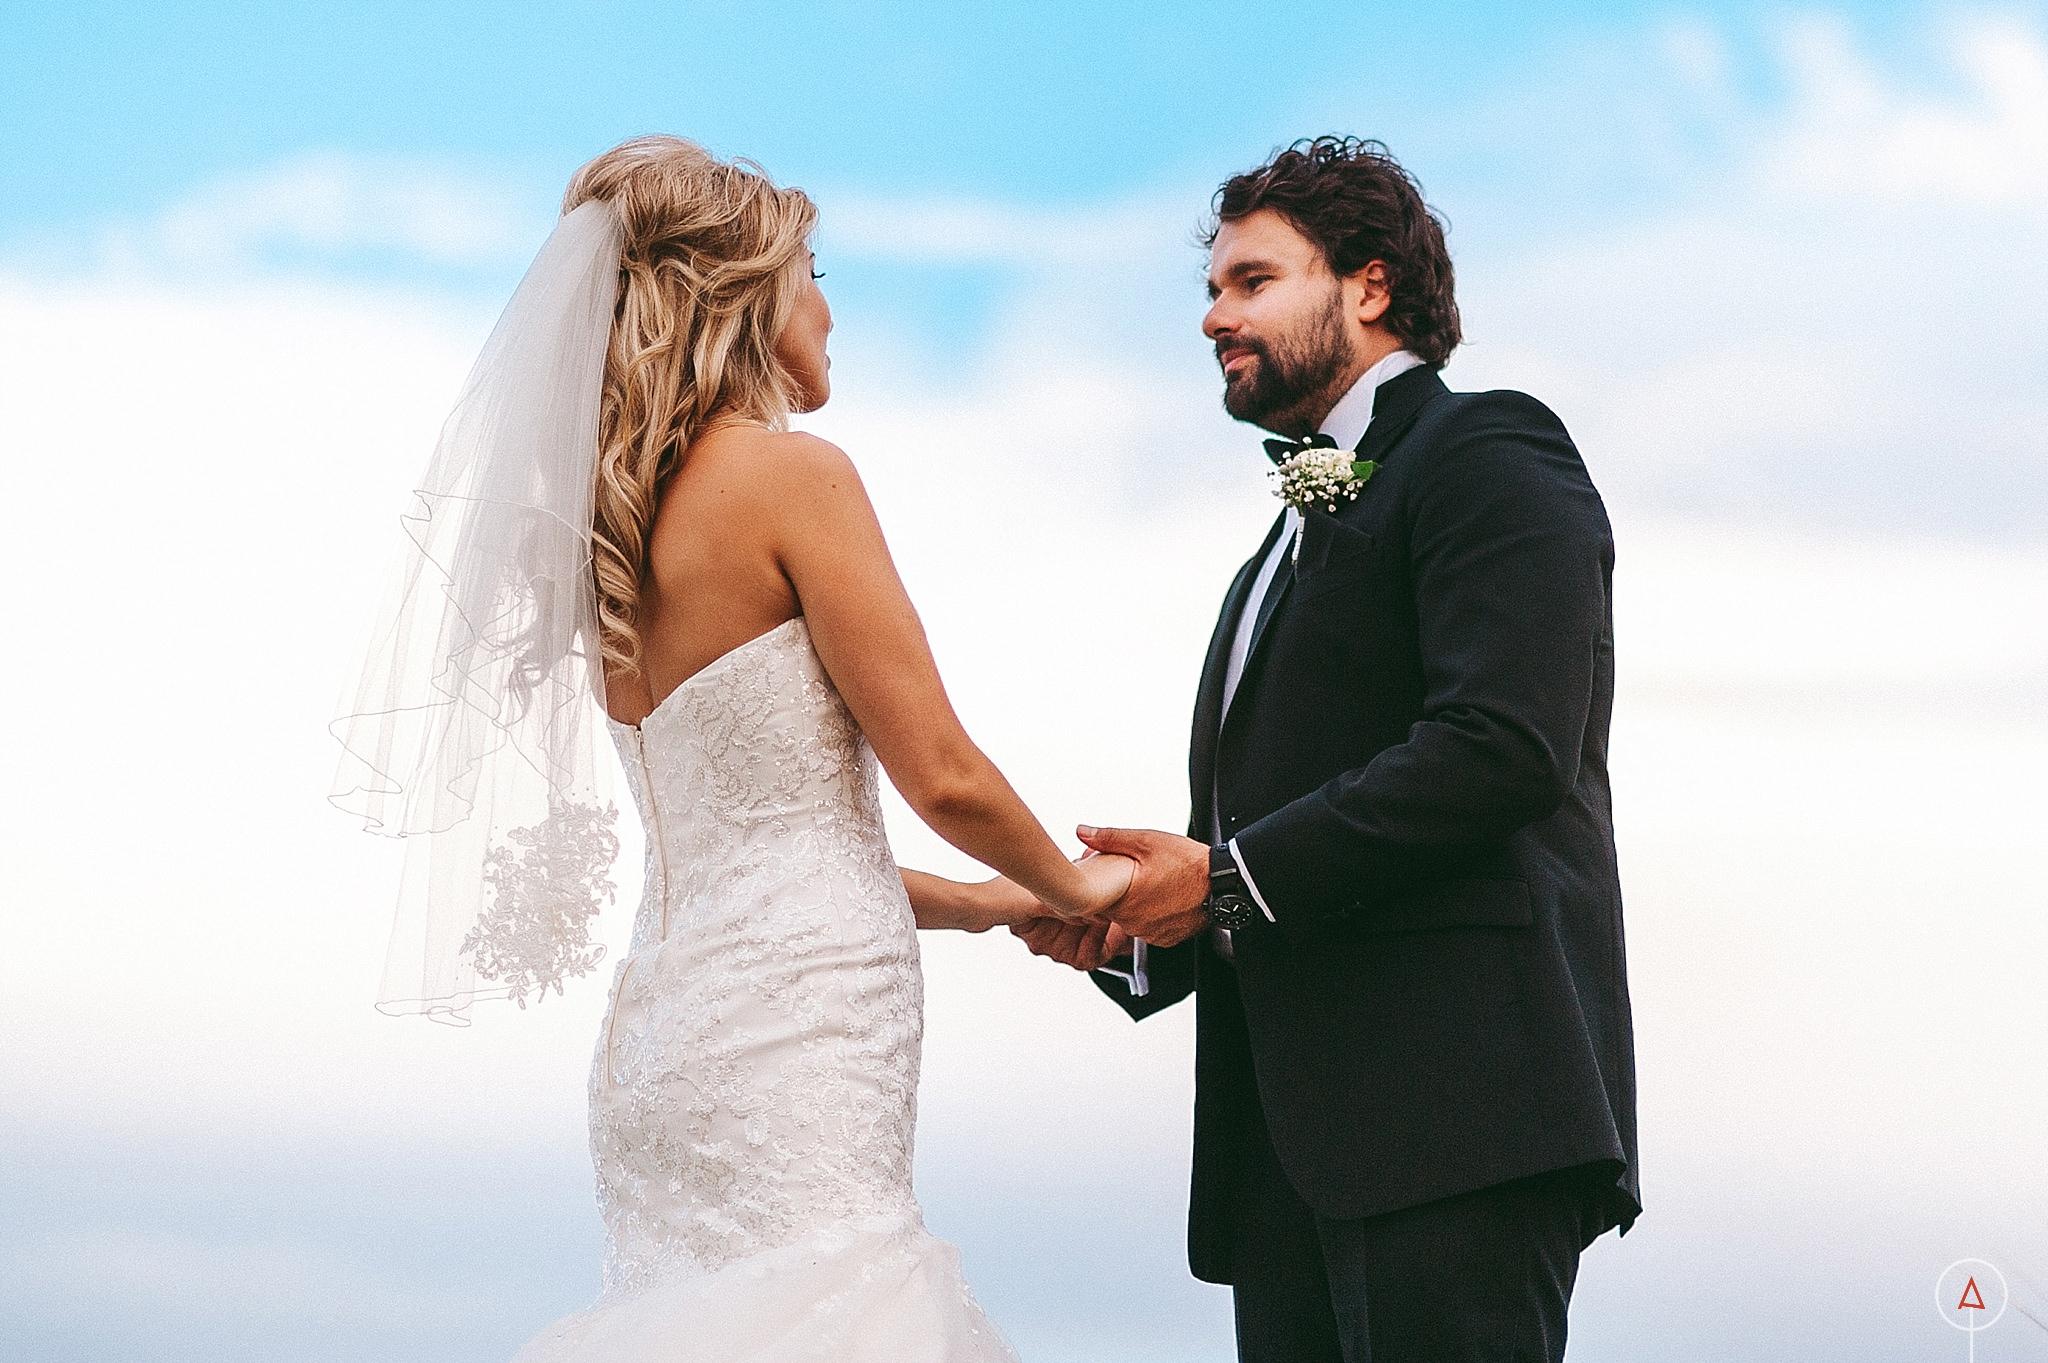 cardiff-wedding-photographer-aga-tomaszek_0405